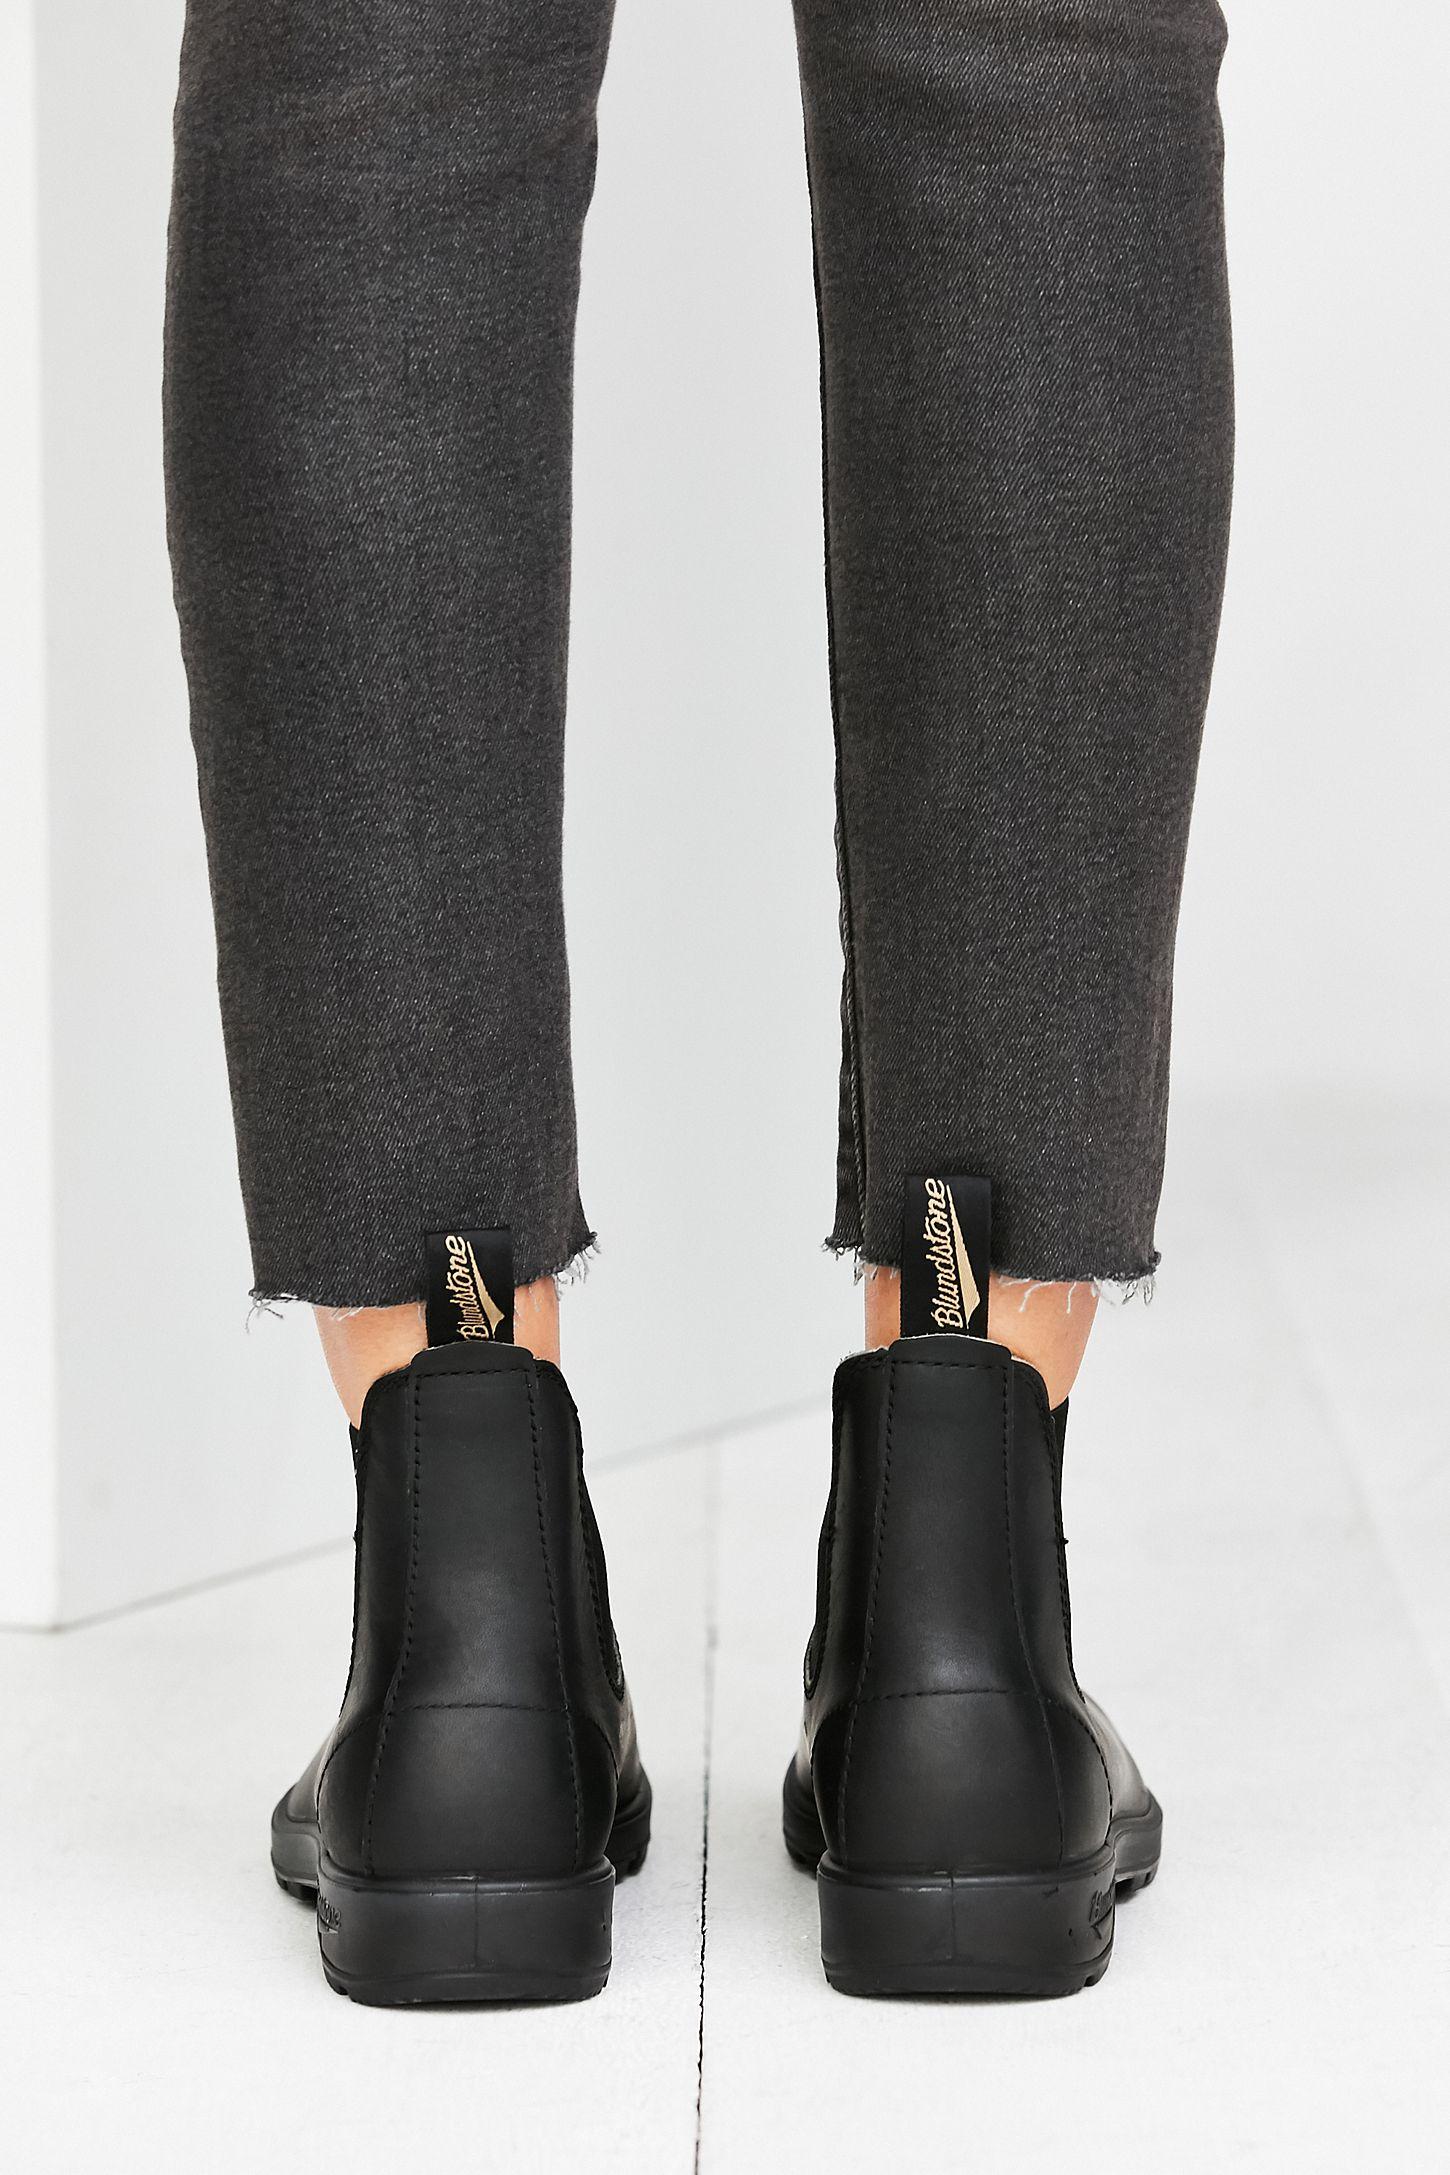 edaacf6eef Blundstone 510 Original Chelsea Boot | Urban Outfitters